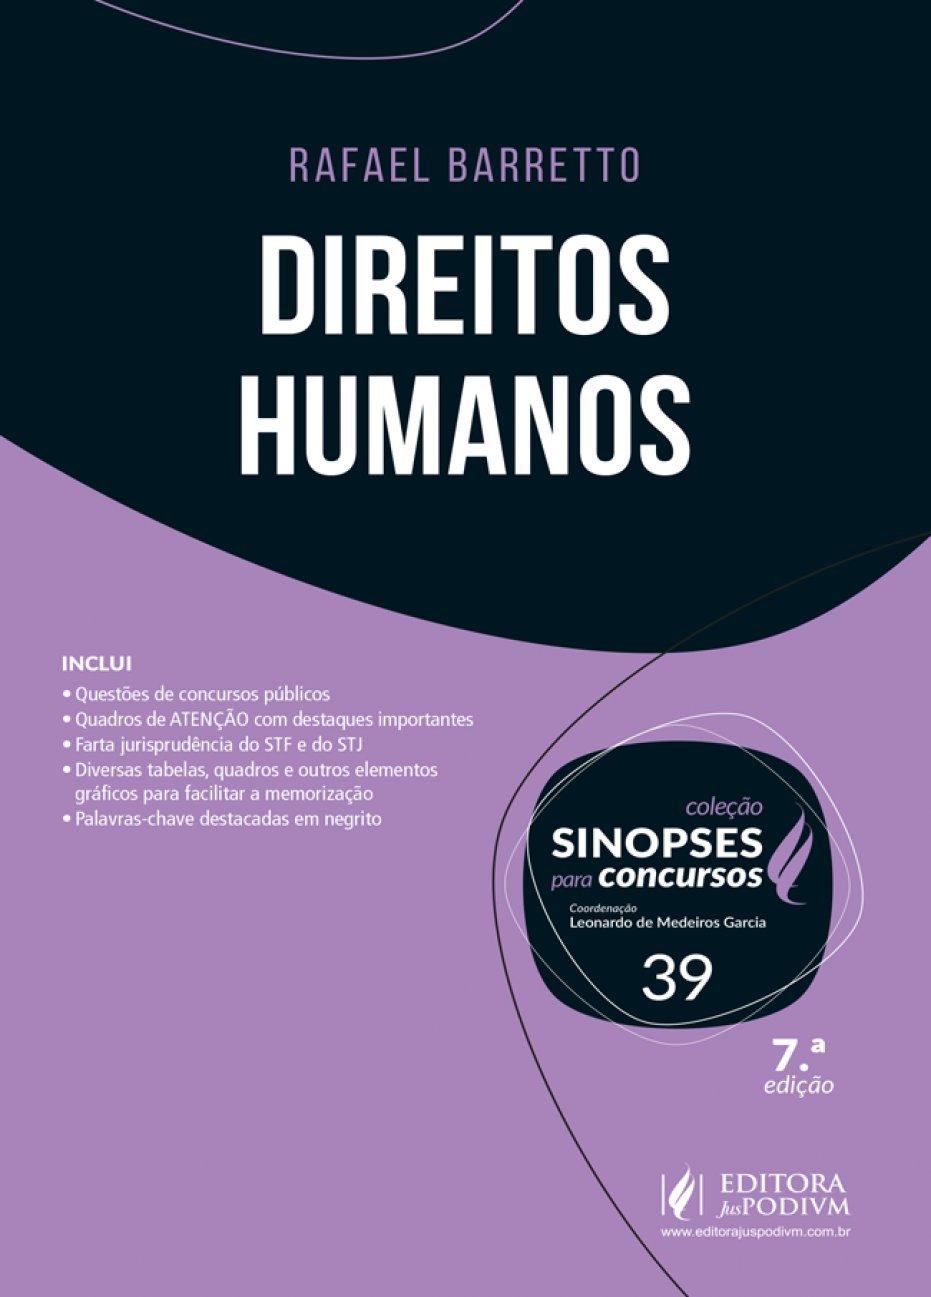 Direitos Humanos - Vol.39 - Colecao Sinopses Para Concursos ebook